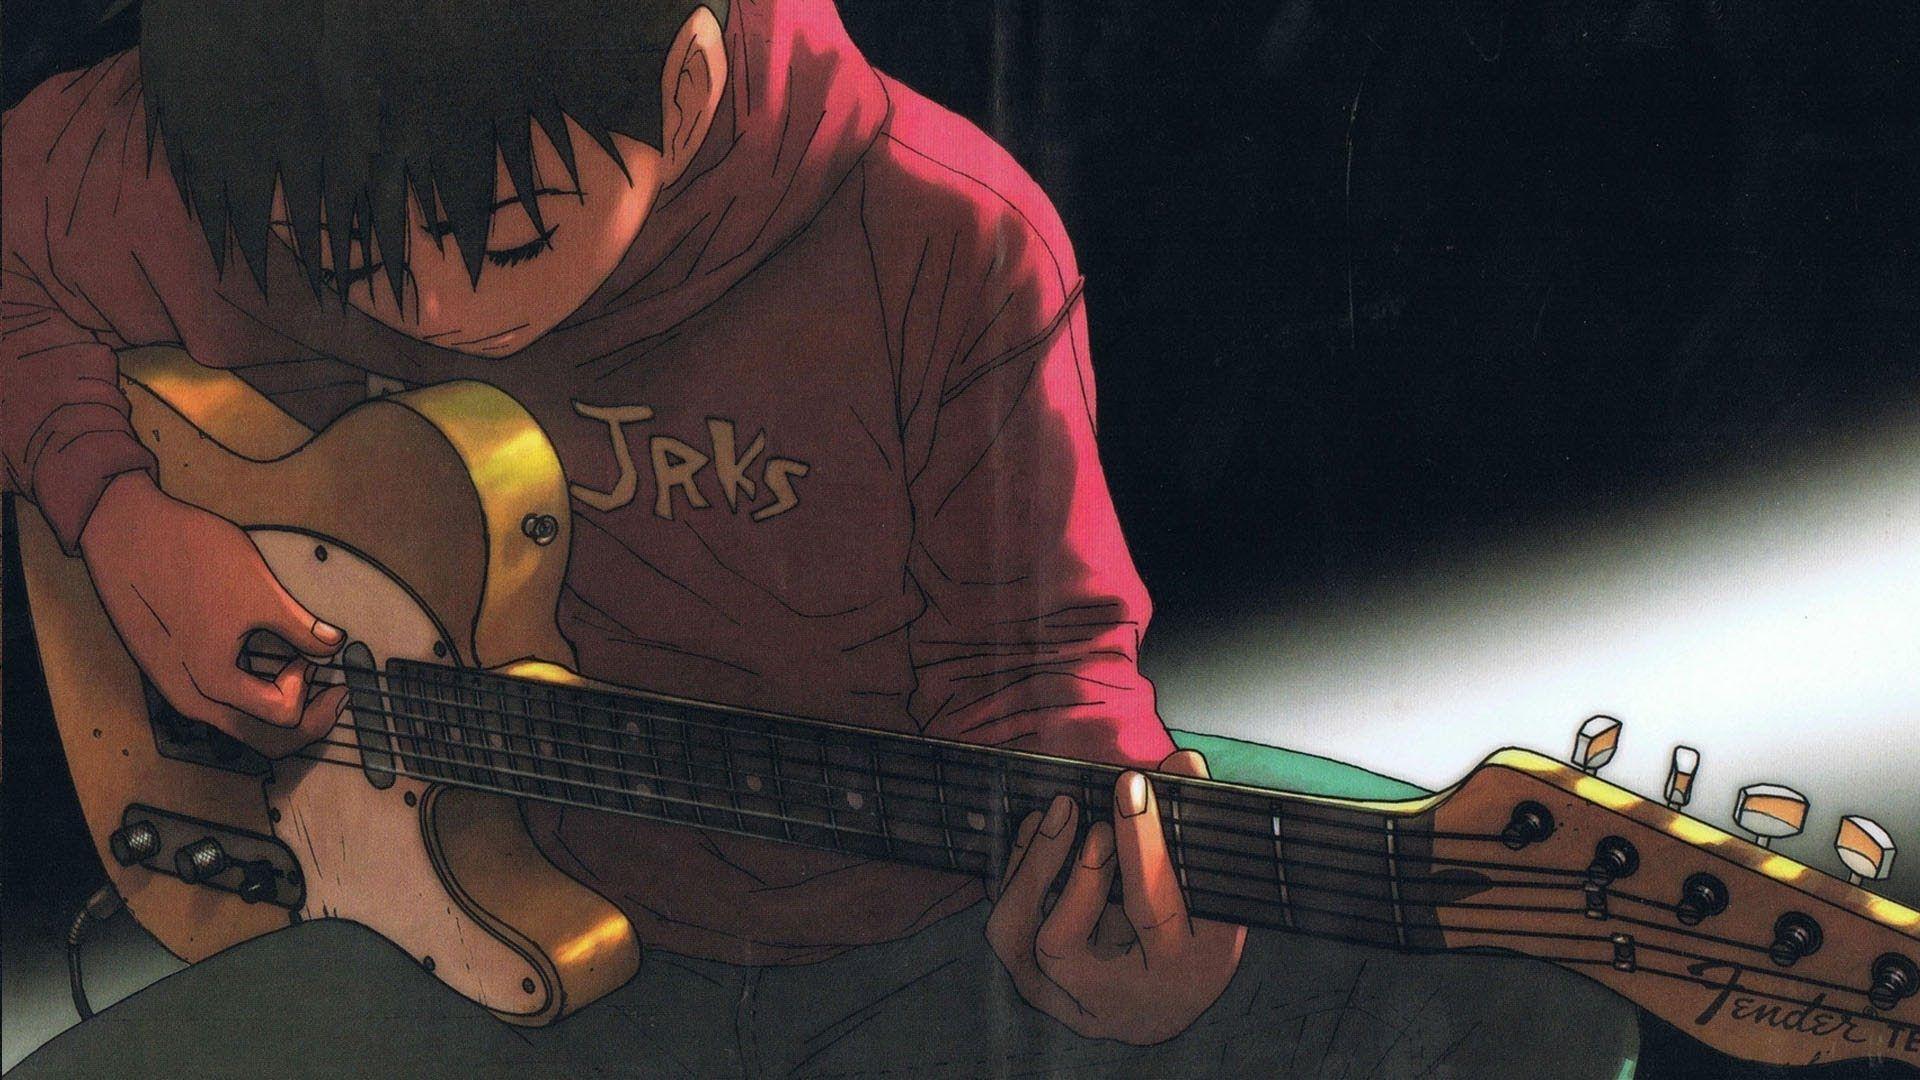 Sad anime guy with guitar wallpapers wallpaper cave - Cartoon boy wallpaper ...